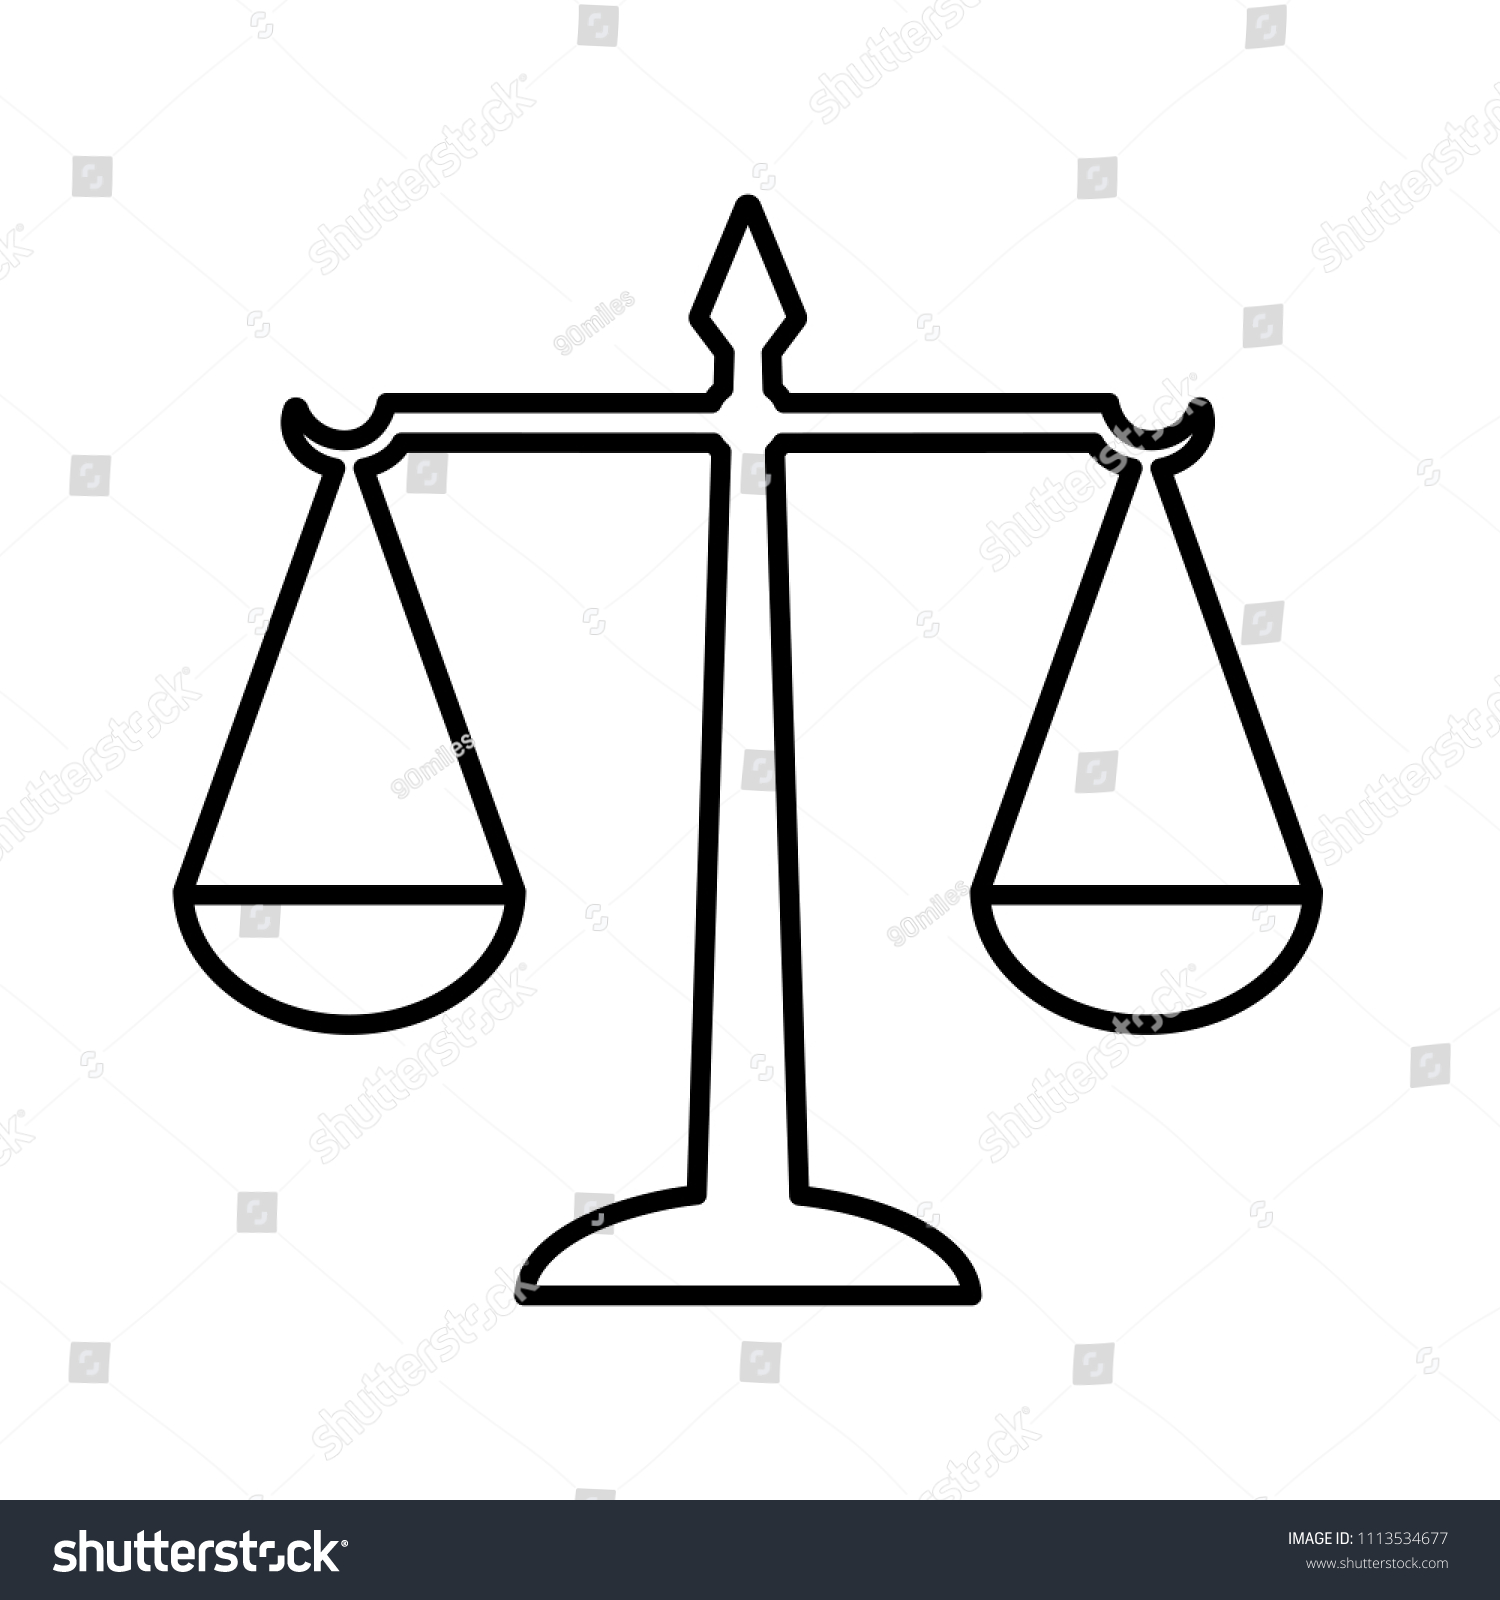 Law Scales Justice Line Icon Symbol Stock Illustration 1113534677